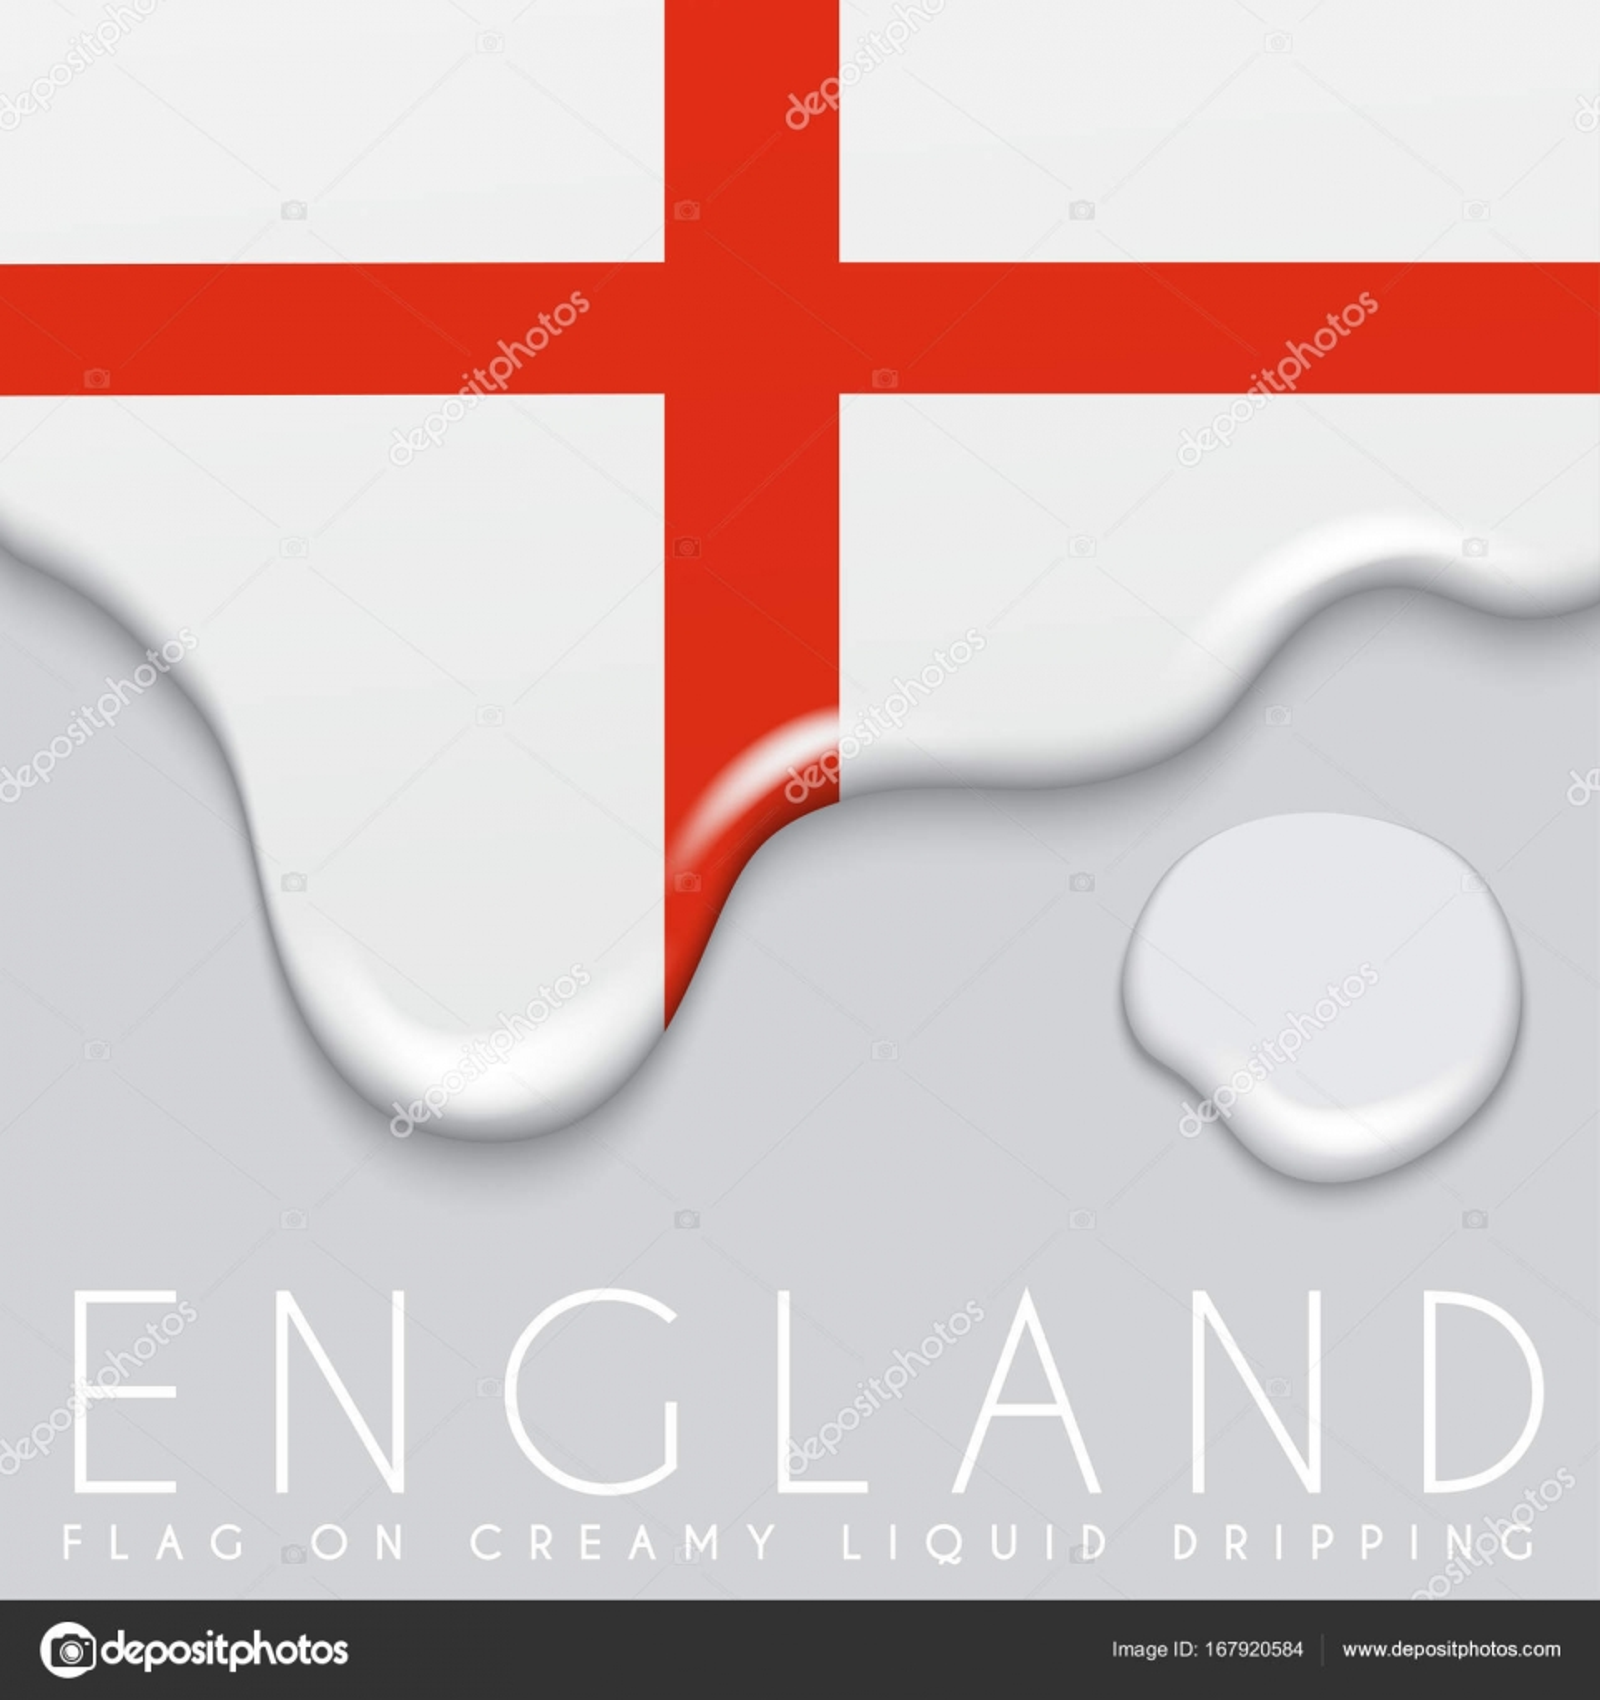 England Flag on Creamy Dripping — Stock Vector © daraon #167920584